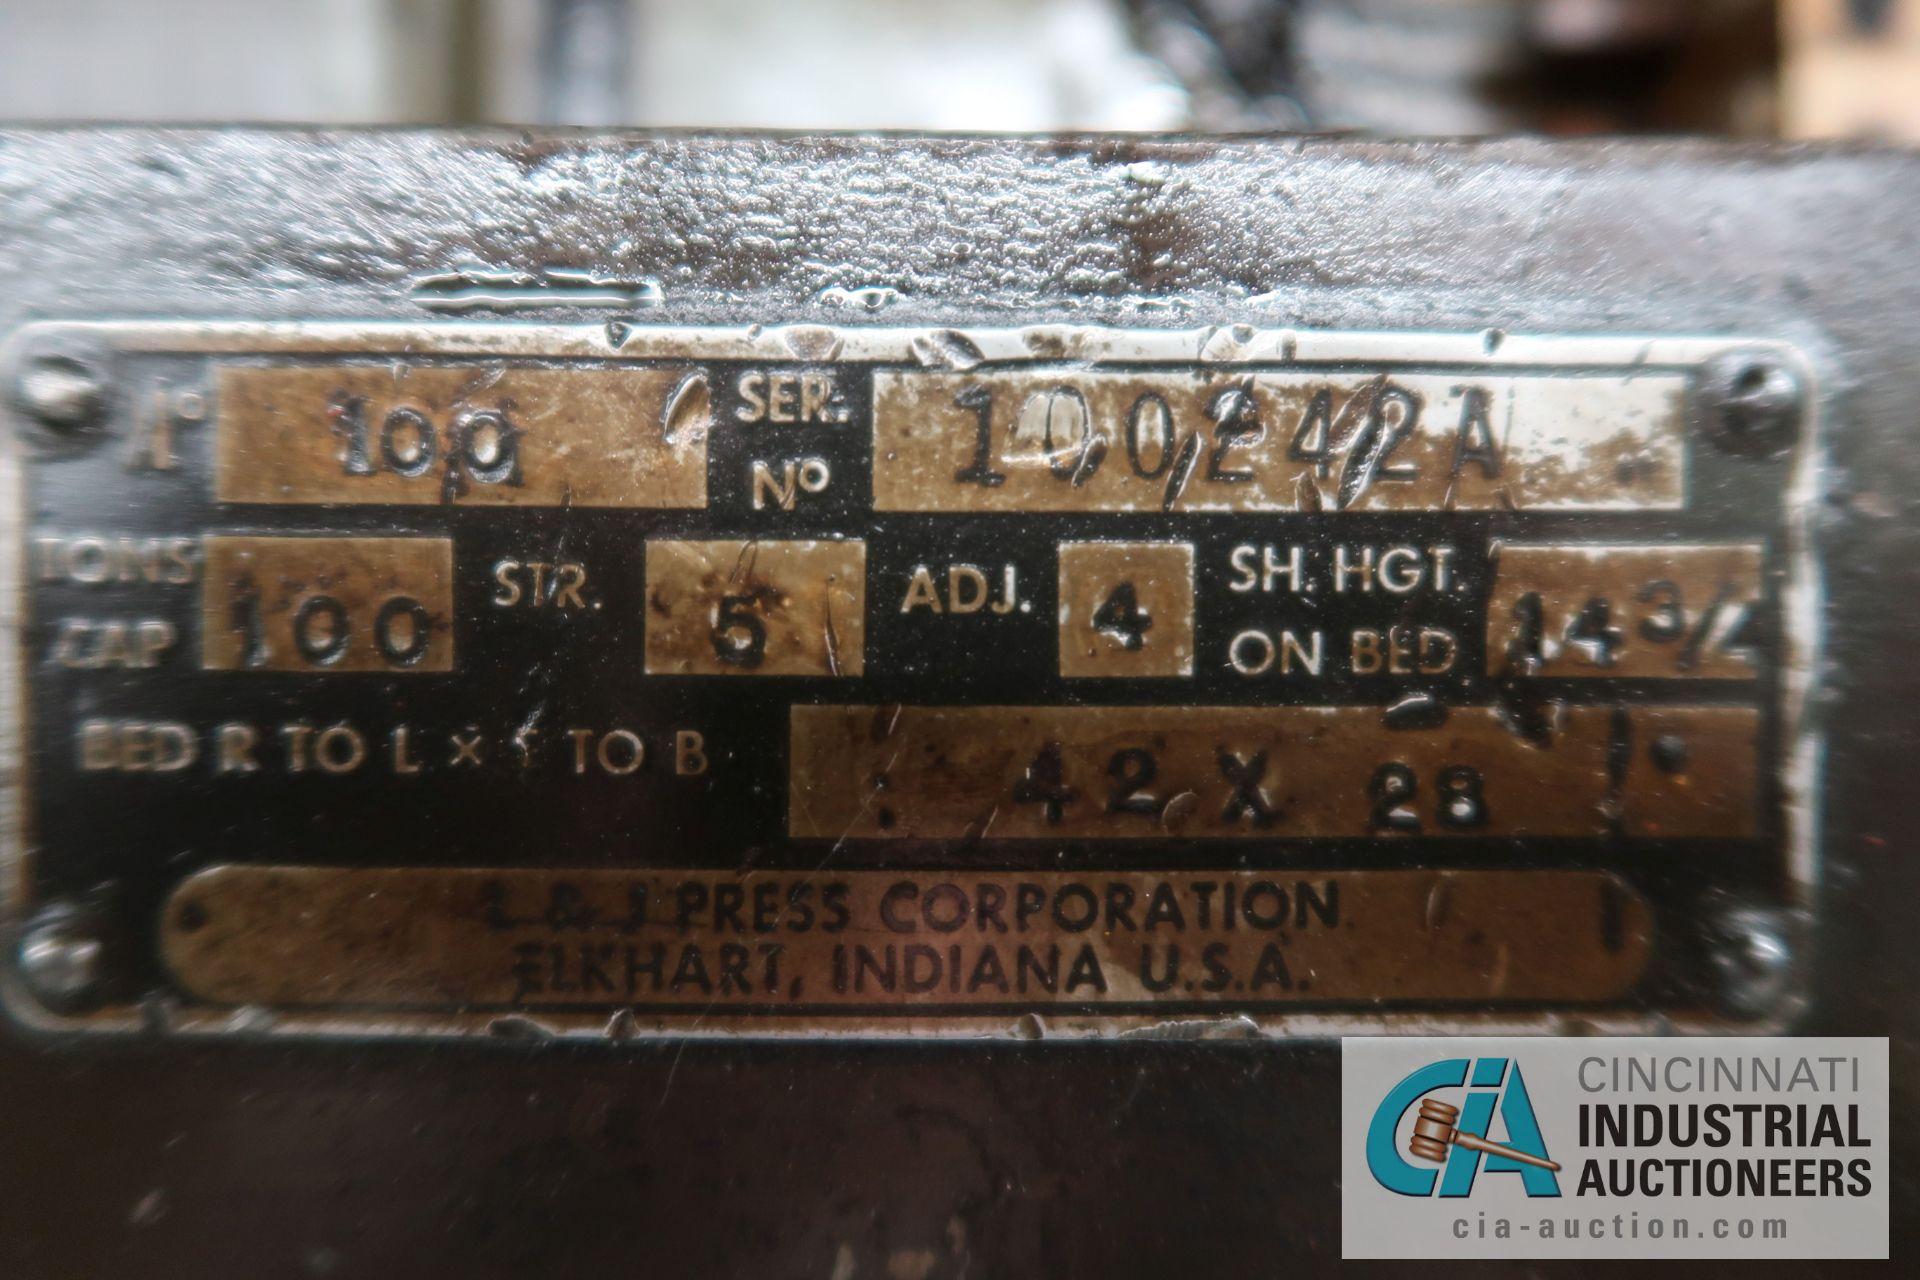 "100 TON CAPACITY L&J BACKED GEARED OBI PRESS; S/N 100242A, 5"" STROKE, 4"" ADJUST, 14-3/4"" SHUT HEIGHT - Image 13 of 13"